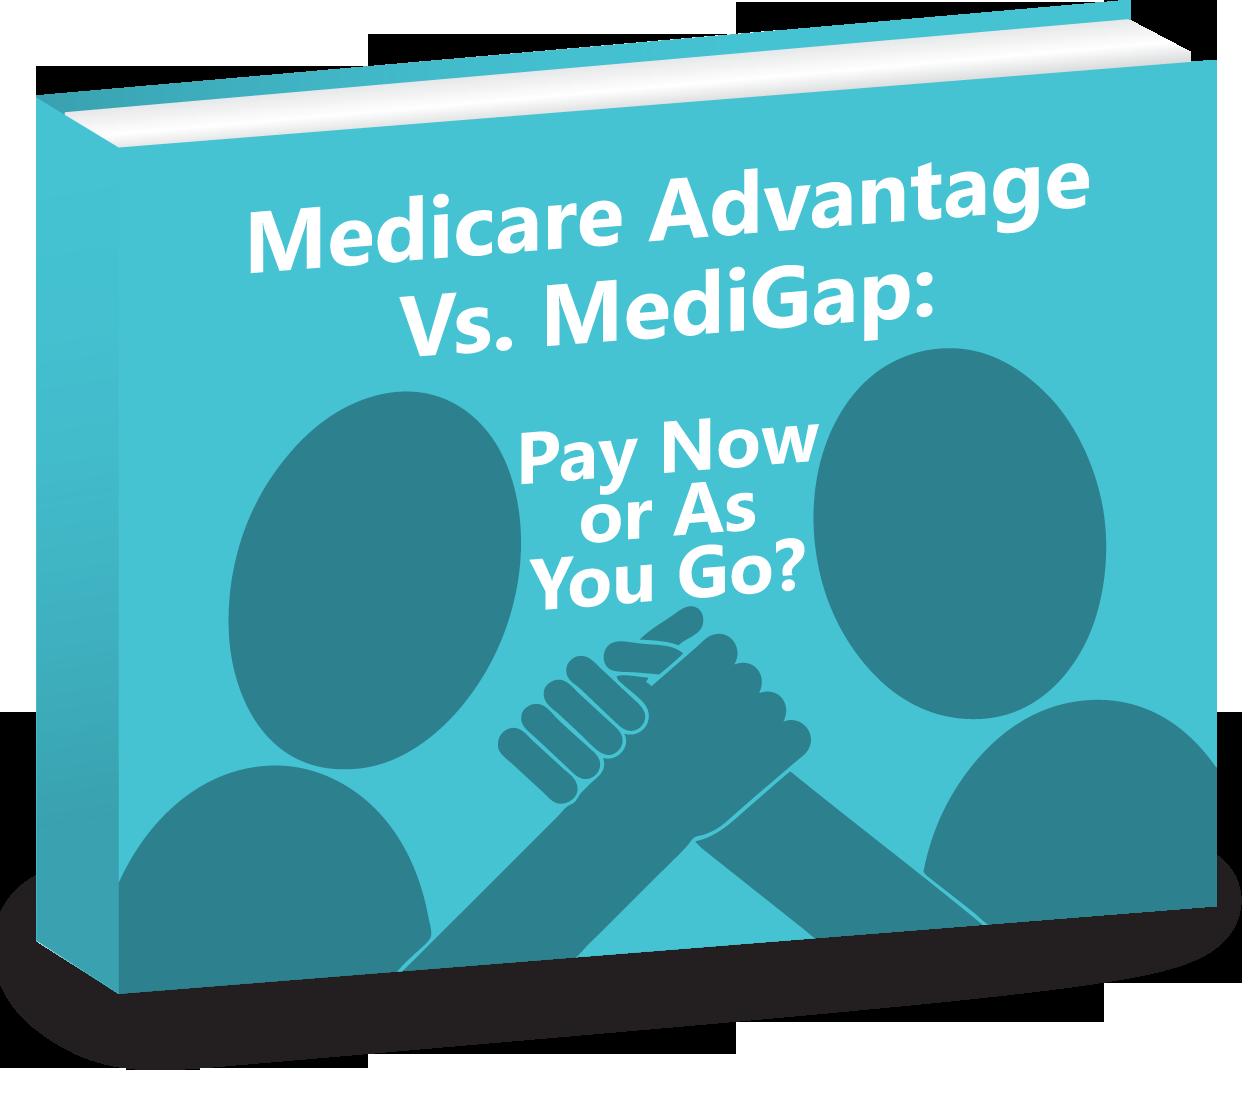 Medicare Advantage Vs. MediGap: Pay Now or As You go?